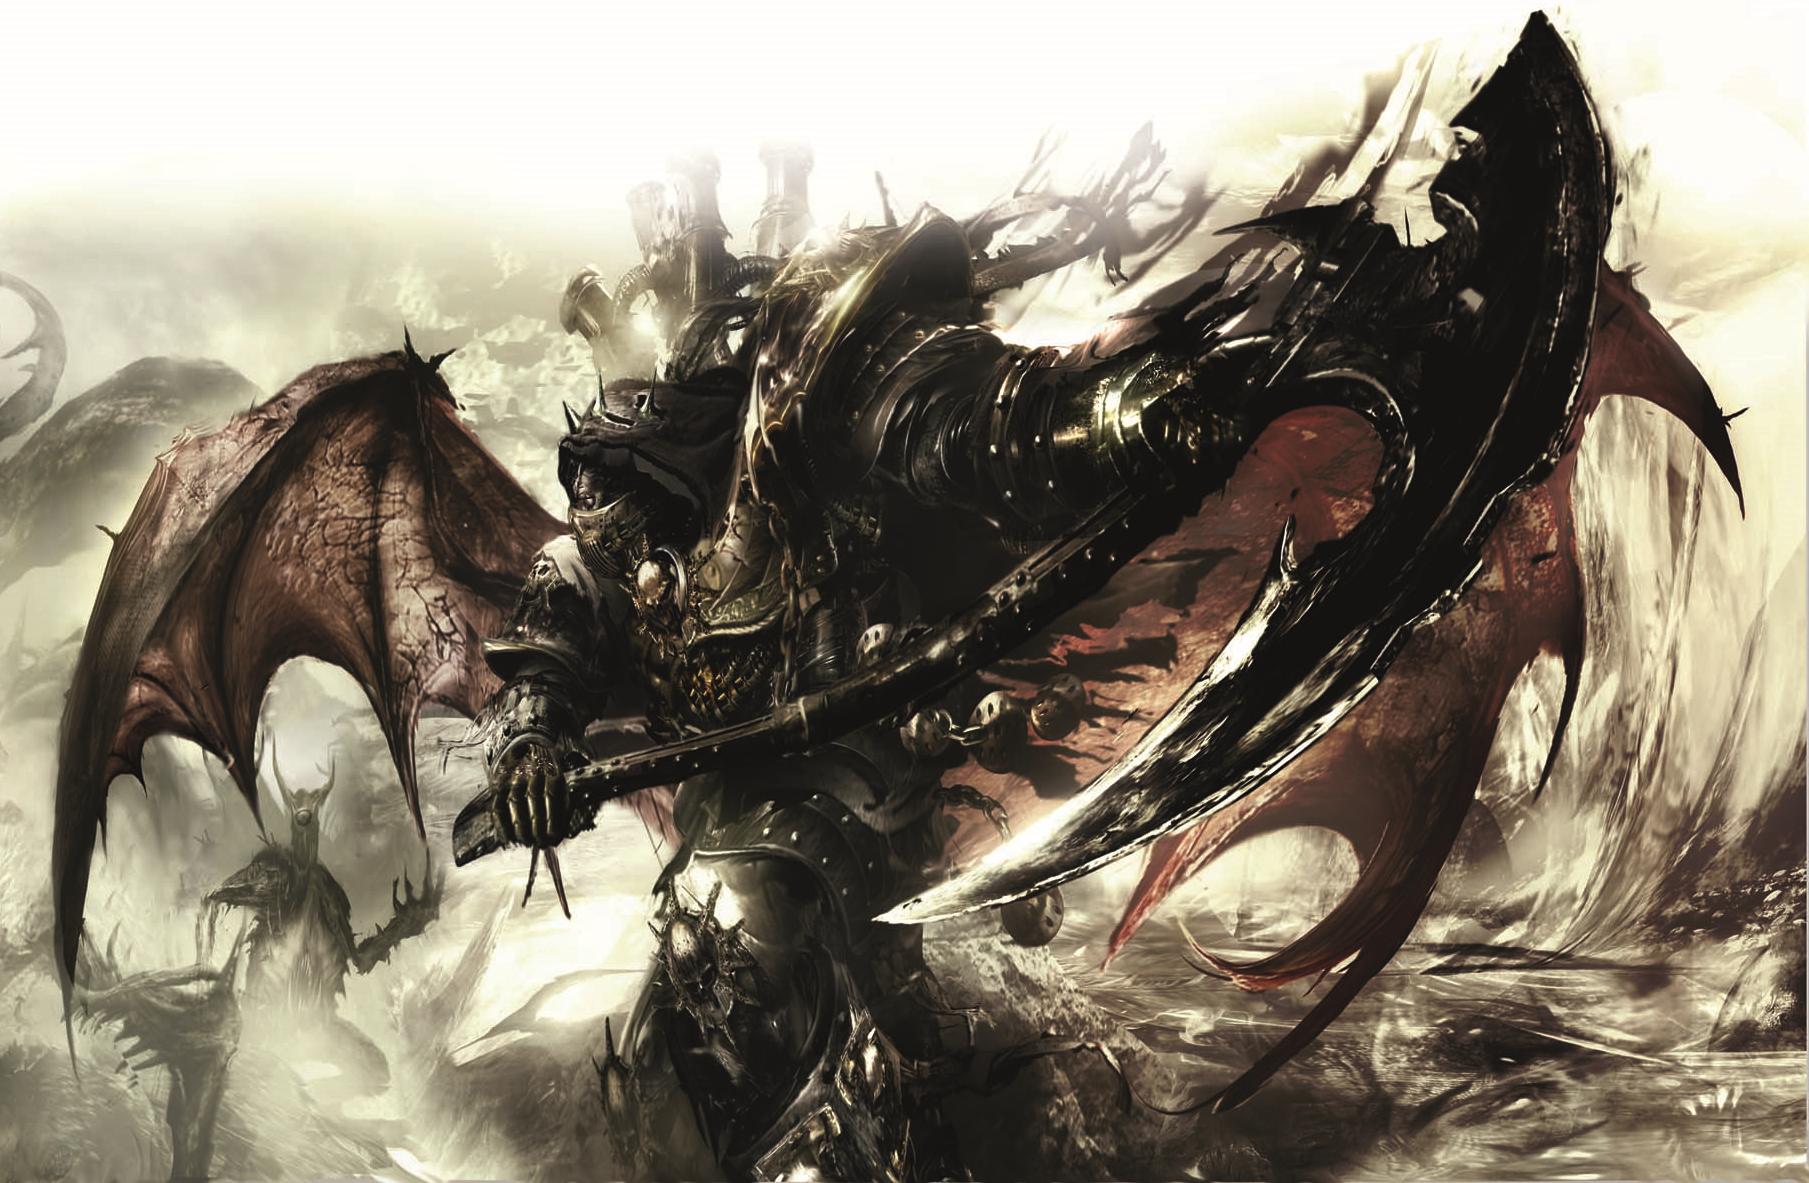 god emperor and primarchs vs sc and sw battles comic vine